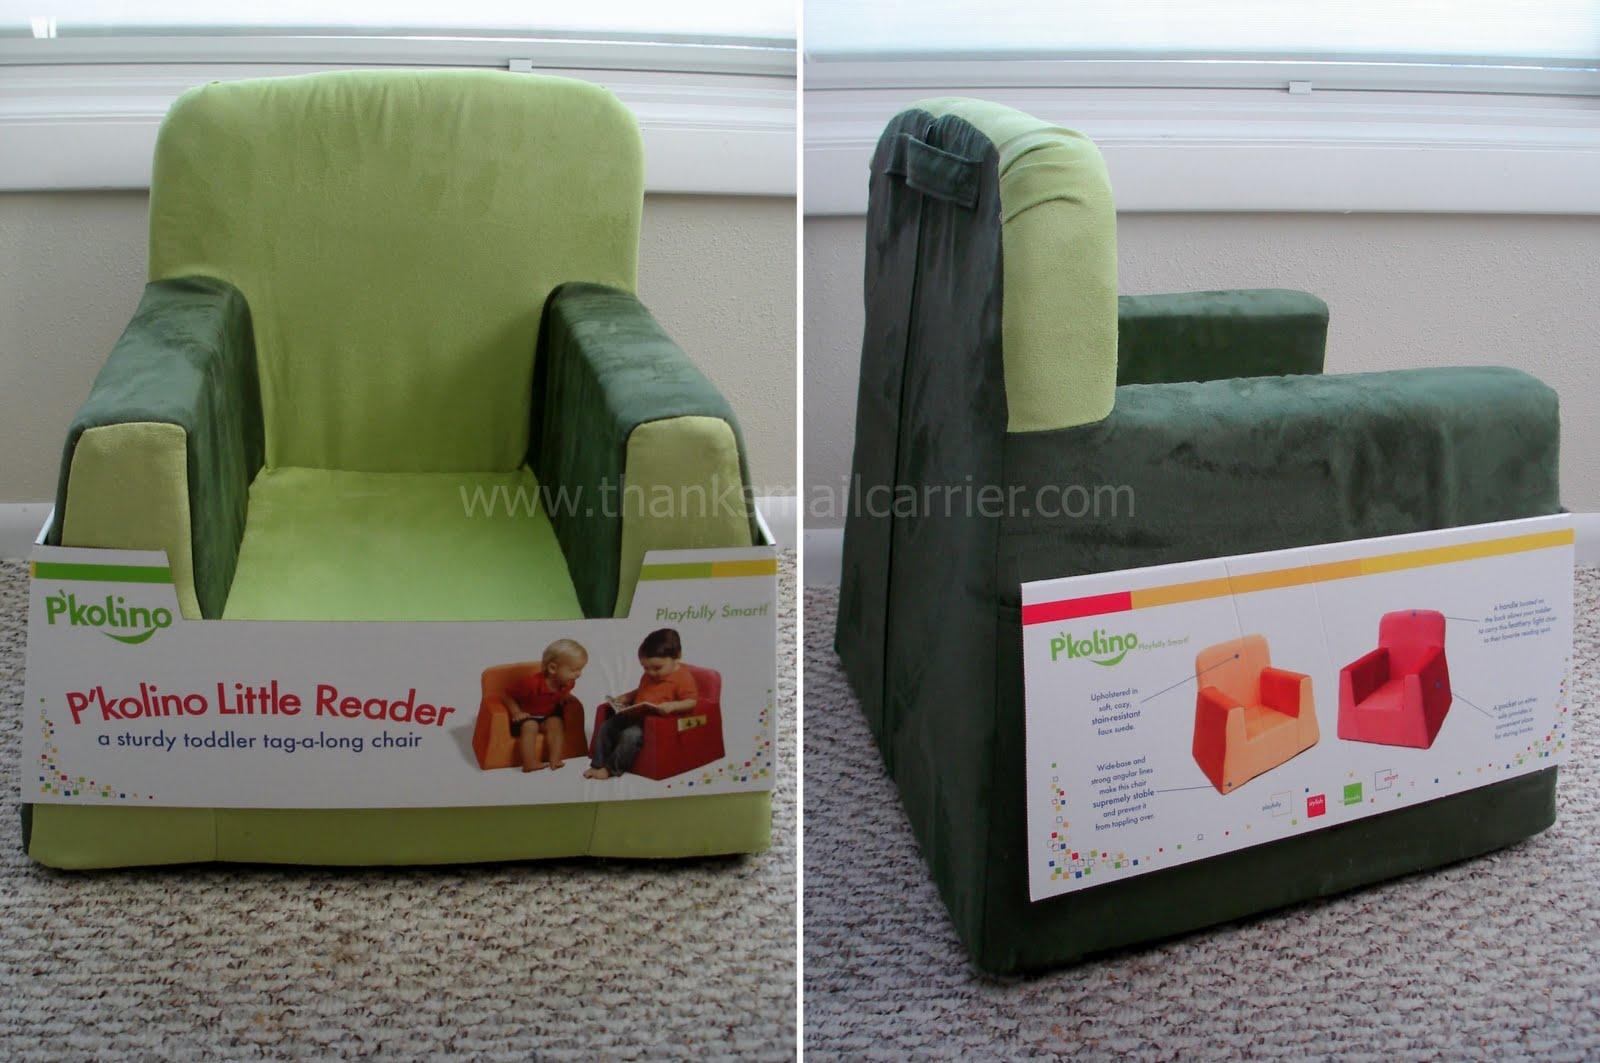 Stupendous Pkolino Little Reader Chair Droughtrelief Org Download Free Architecture Designs Sospemadebymaigaardcom